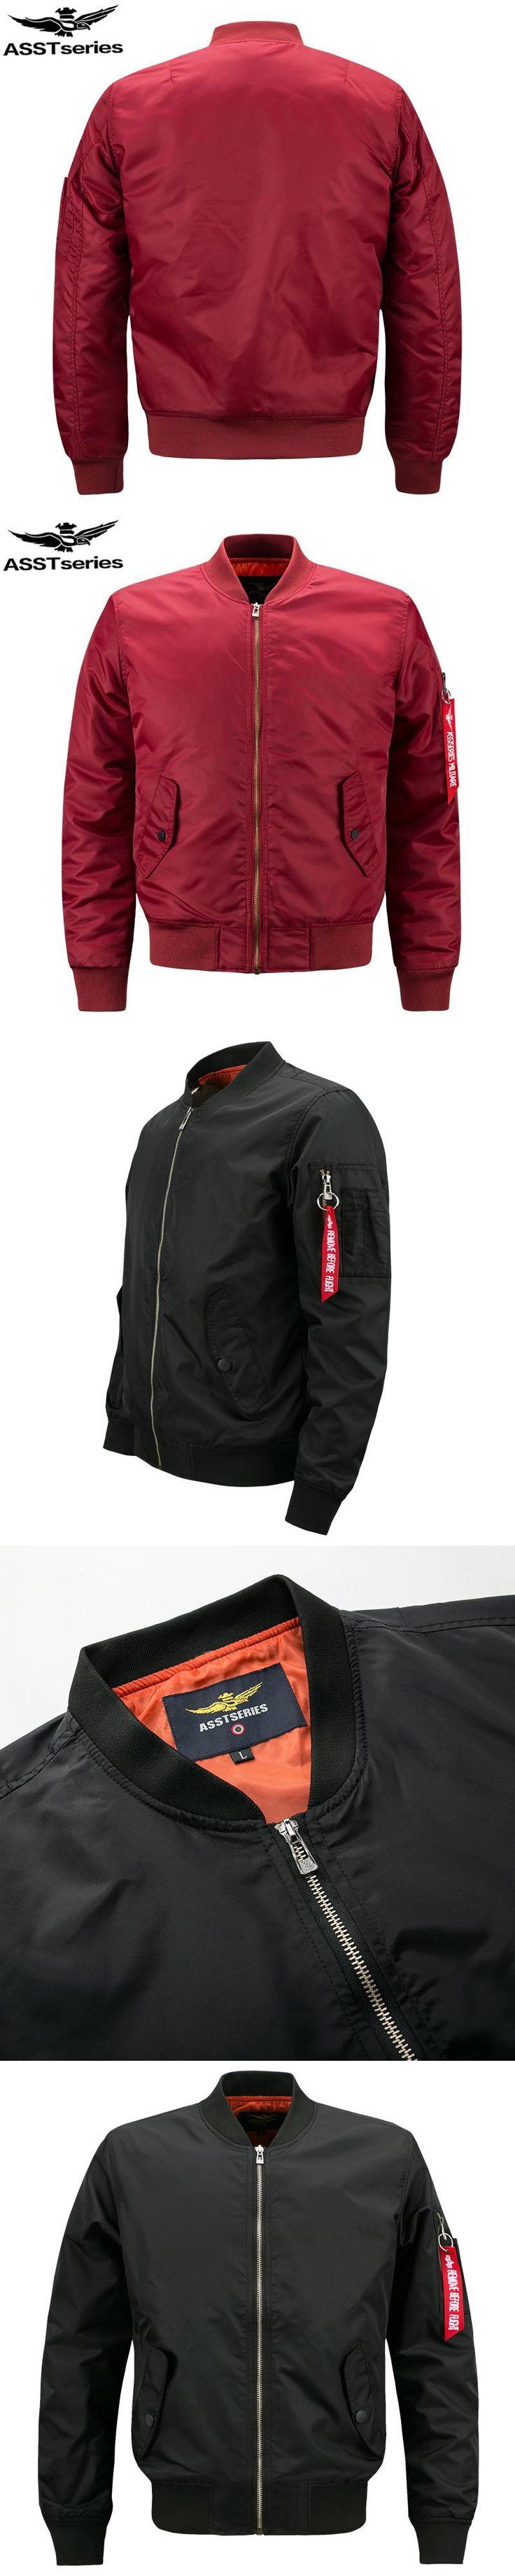 Bomber Jacket Men Plus Size Jacket For Men Military Jacket Men Mens Spring Jackets And Coats Male 2018 Customize Your Logo.DA27